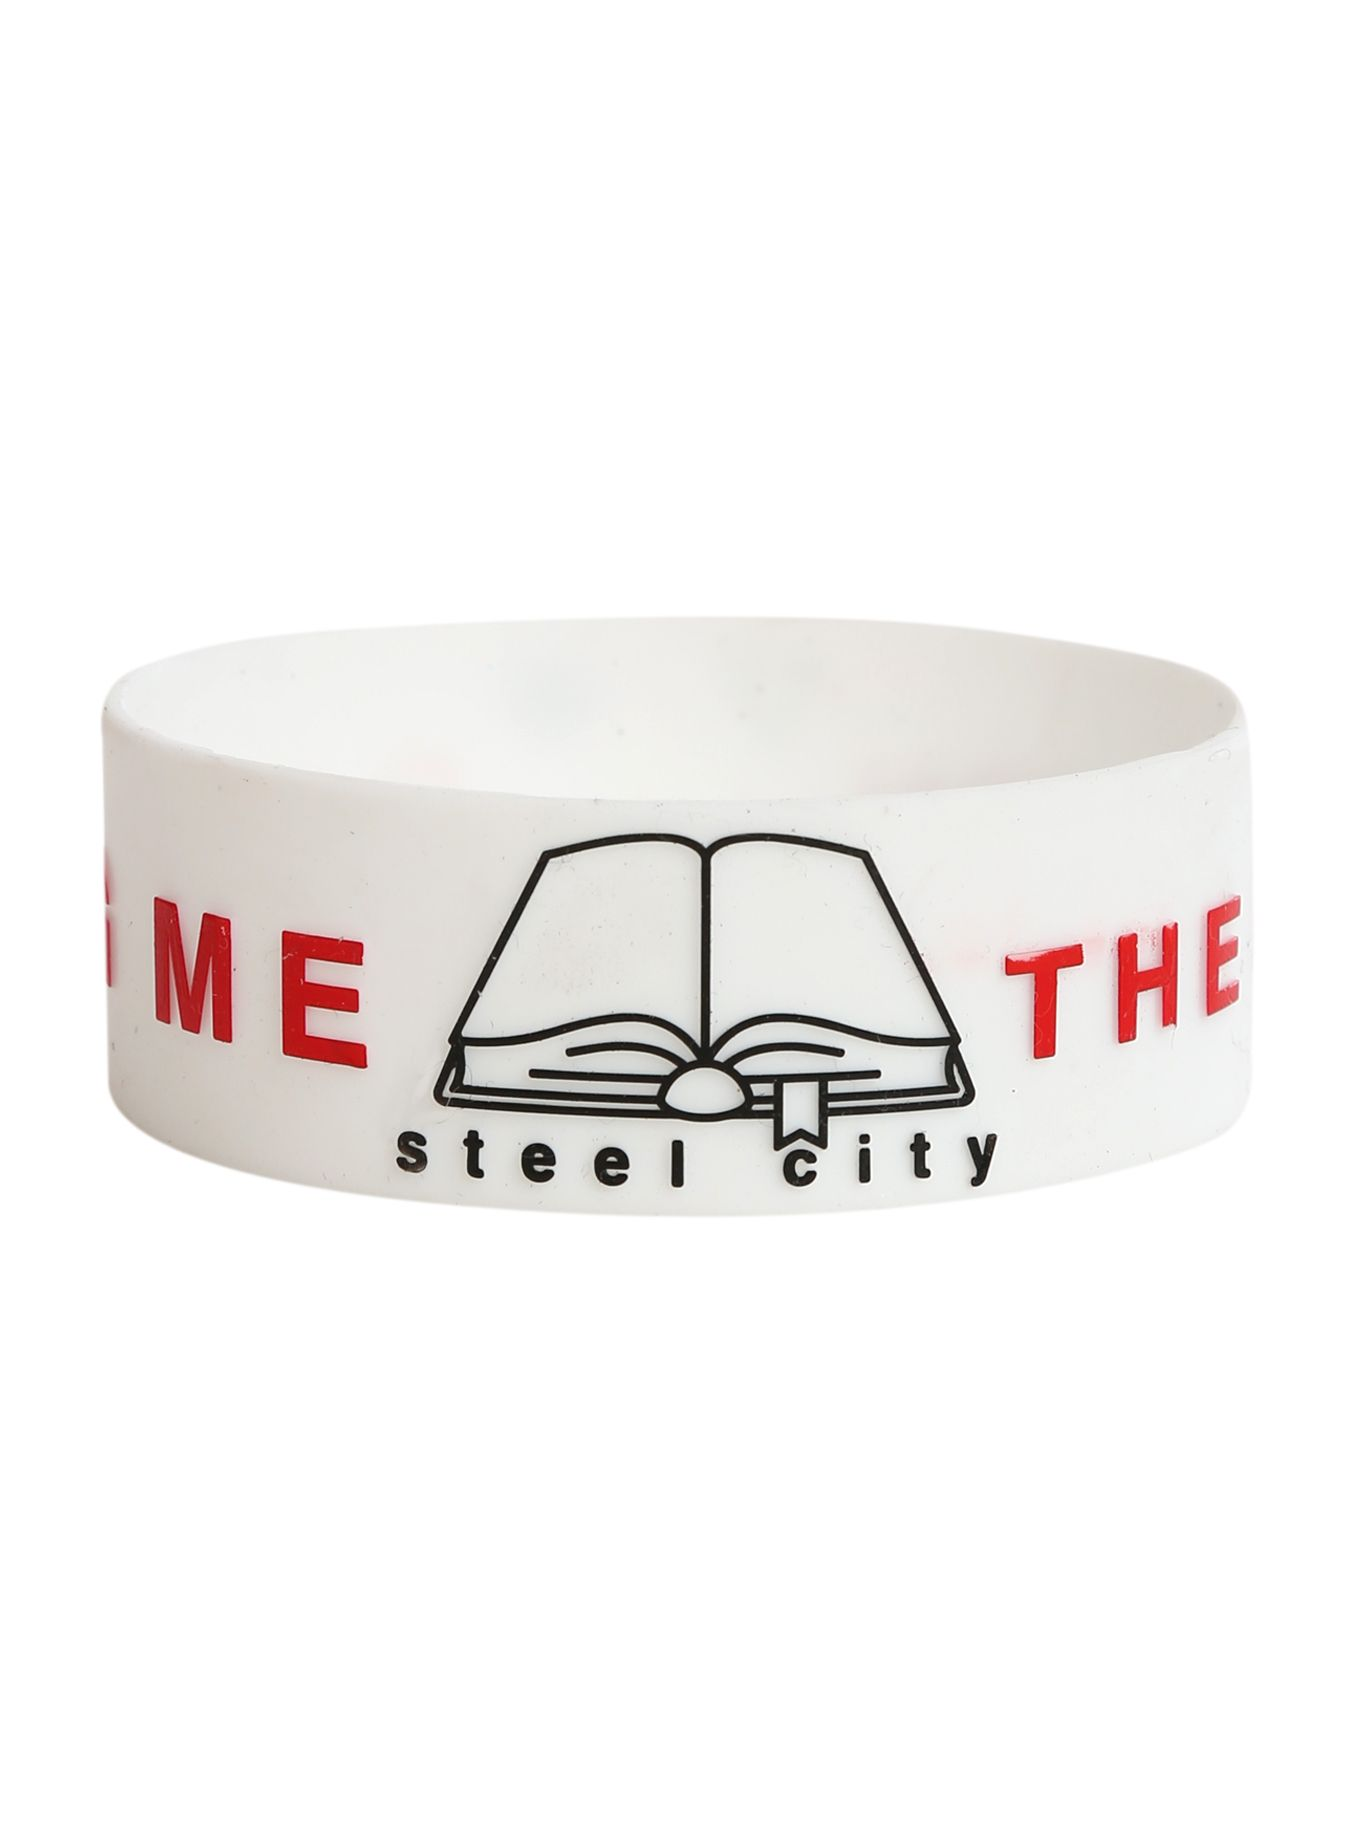 Bring Me The Horizon Steel City Rubber Bracelet   Hot Topic